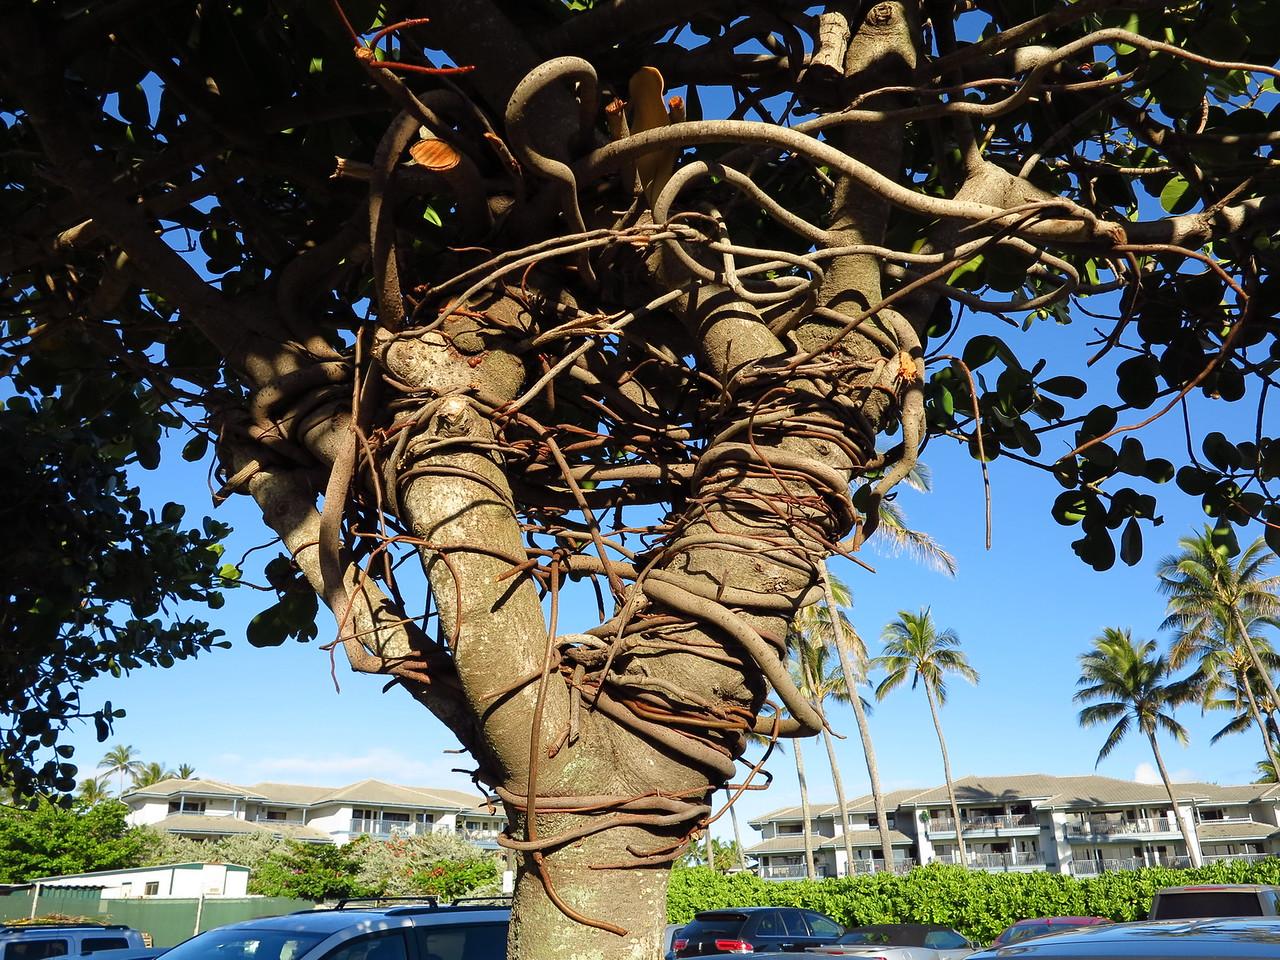 Clusia rosea – Autograph Tree